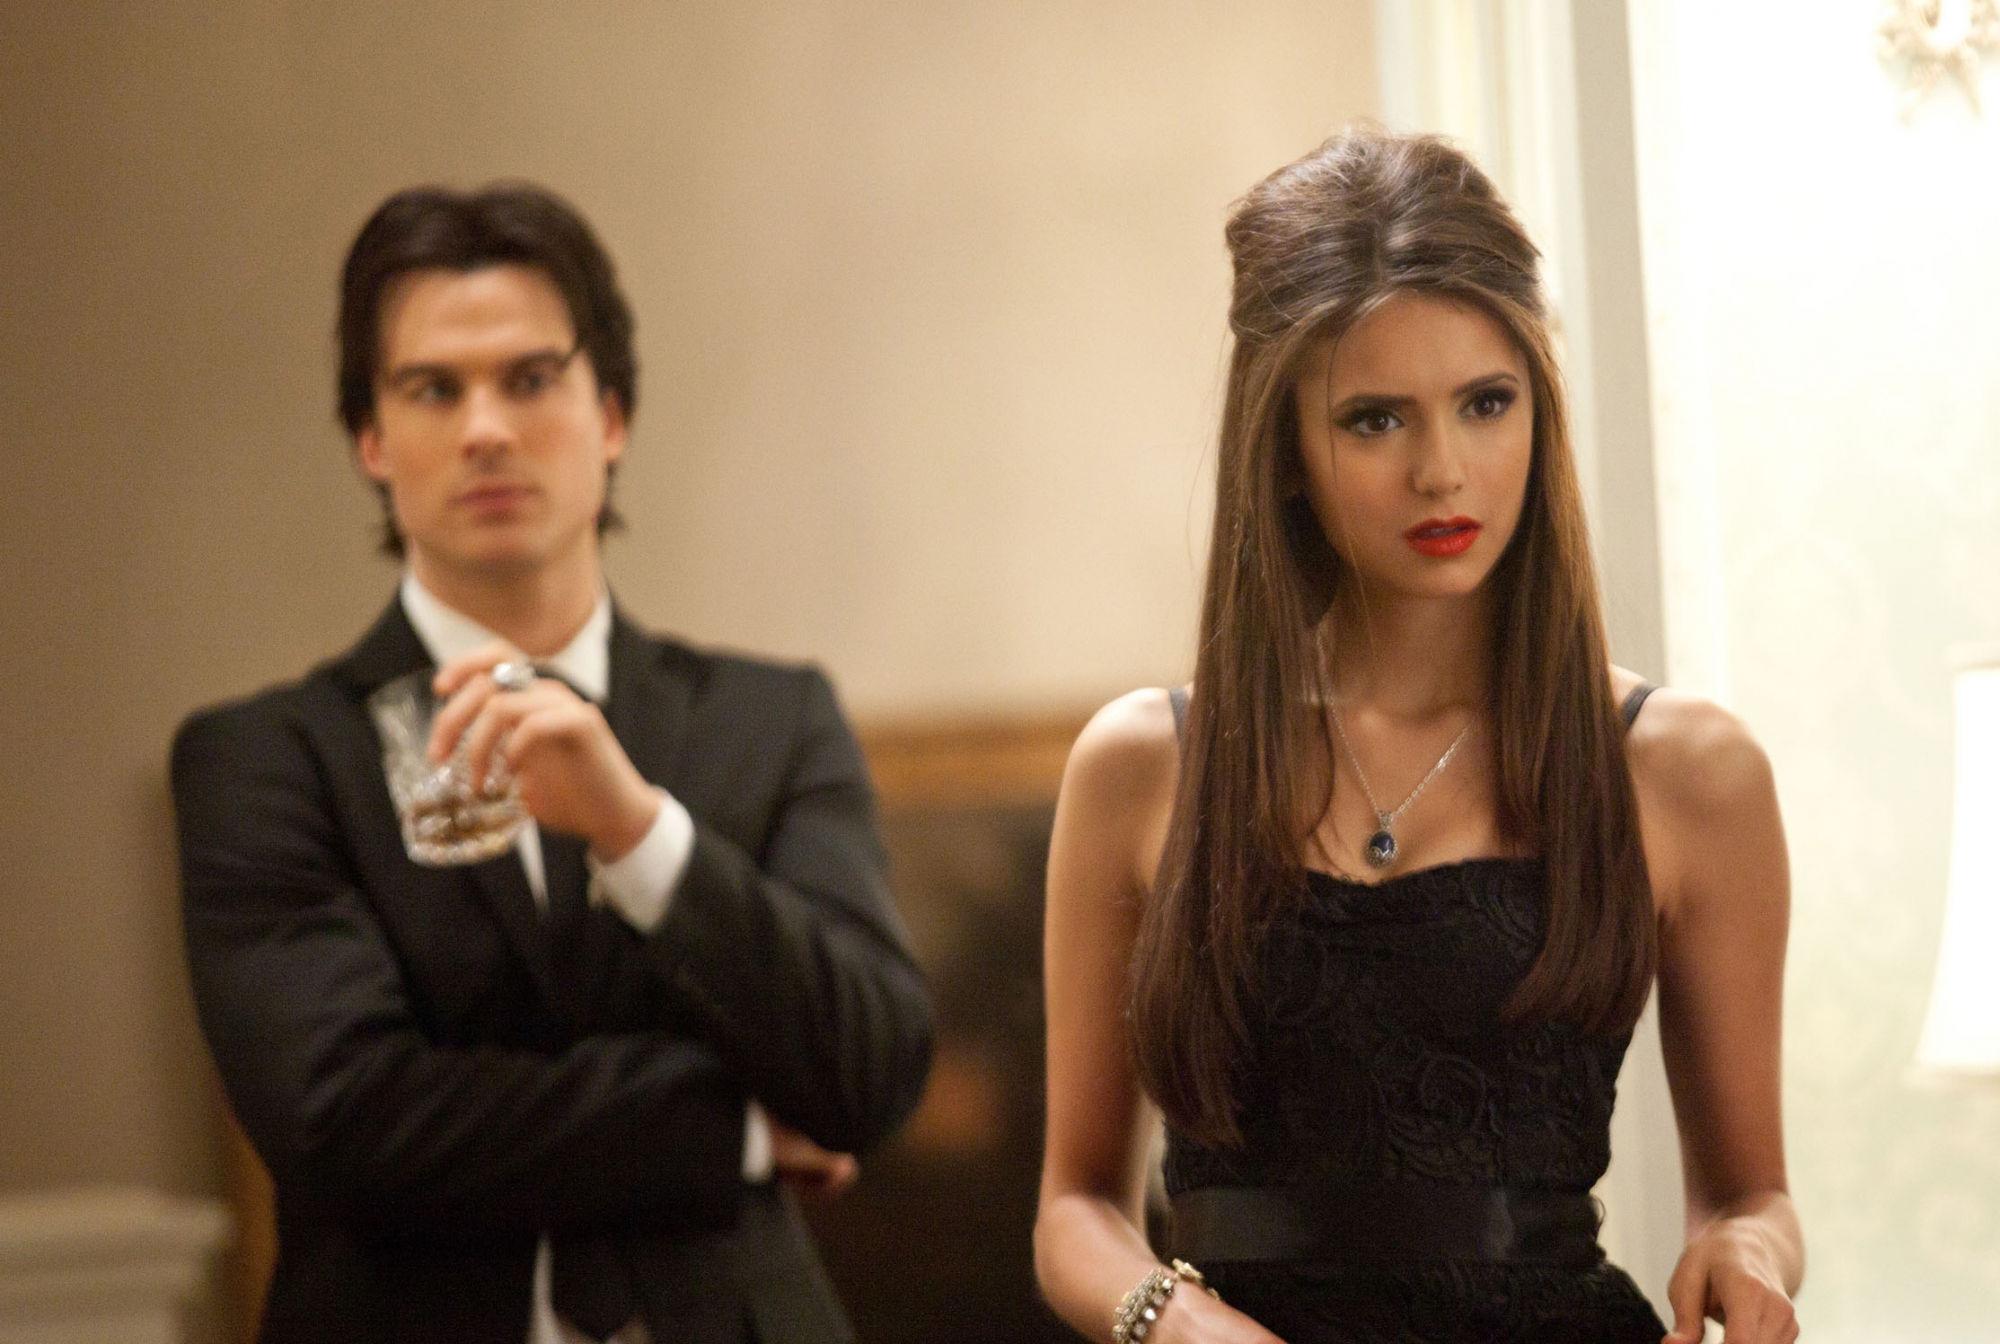 Damon et Elena Wallpaper hd